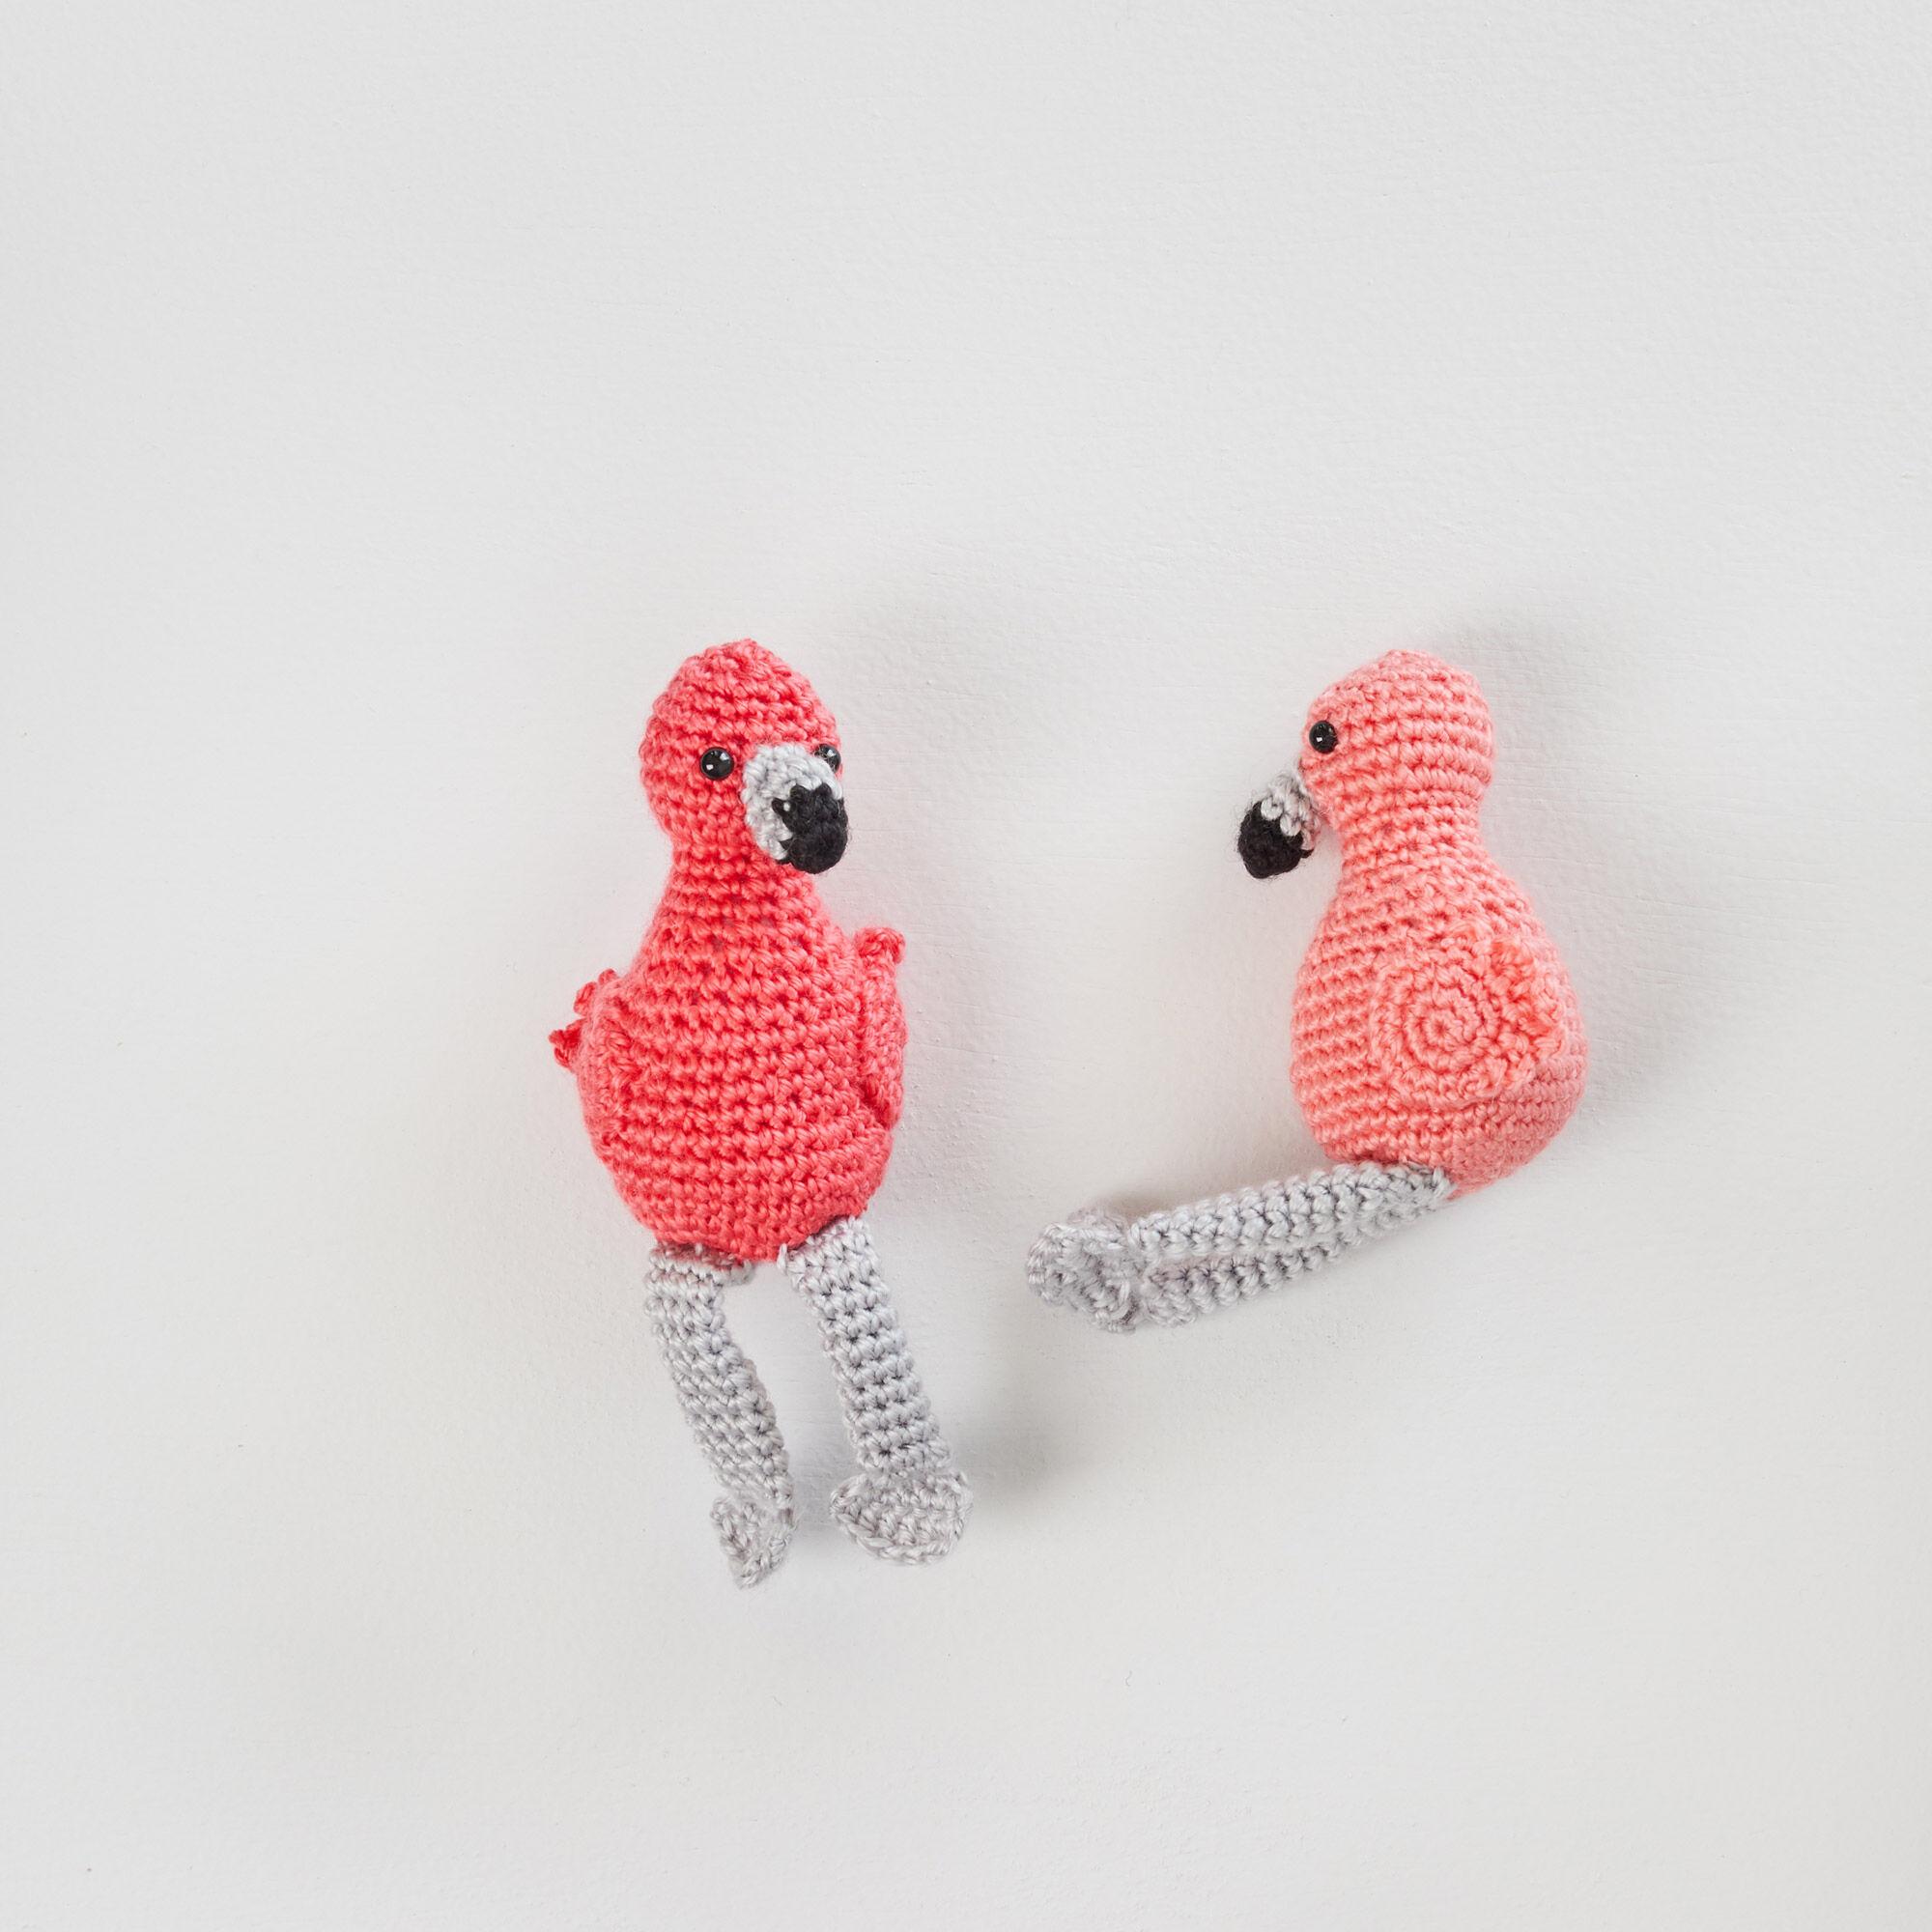 Making the Flamingo! | Crochet Flamingo Progress - YouTube | 2000x2000